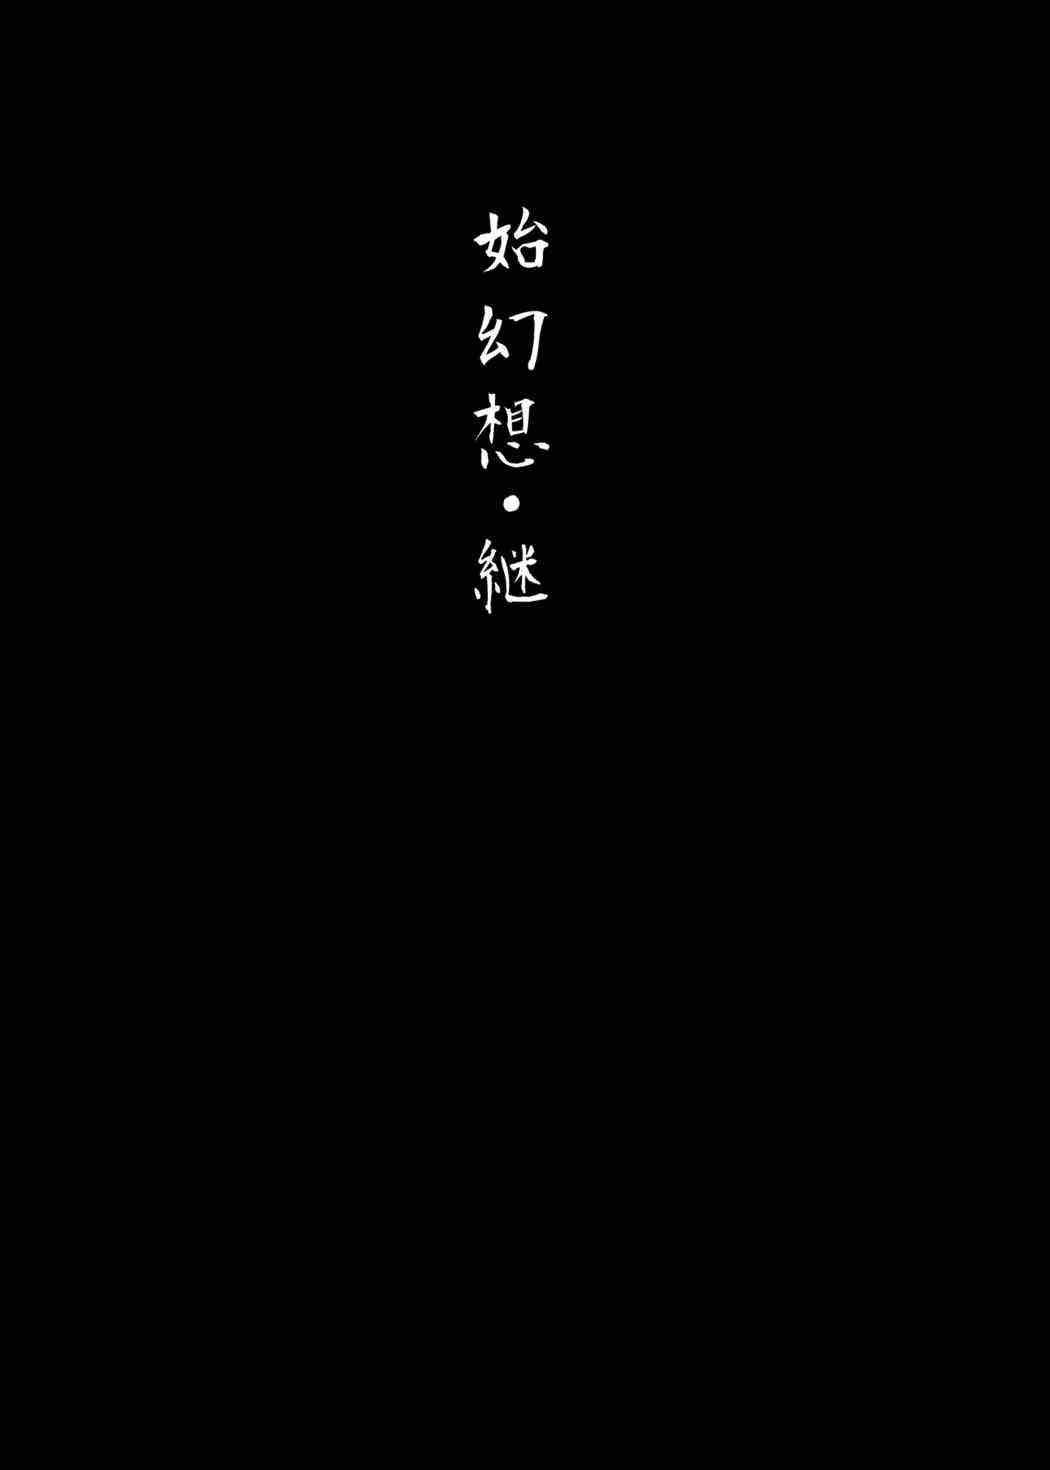 Shigensou 1